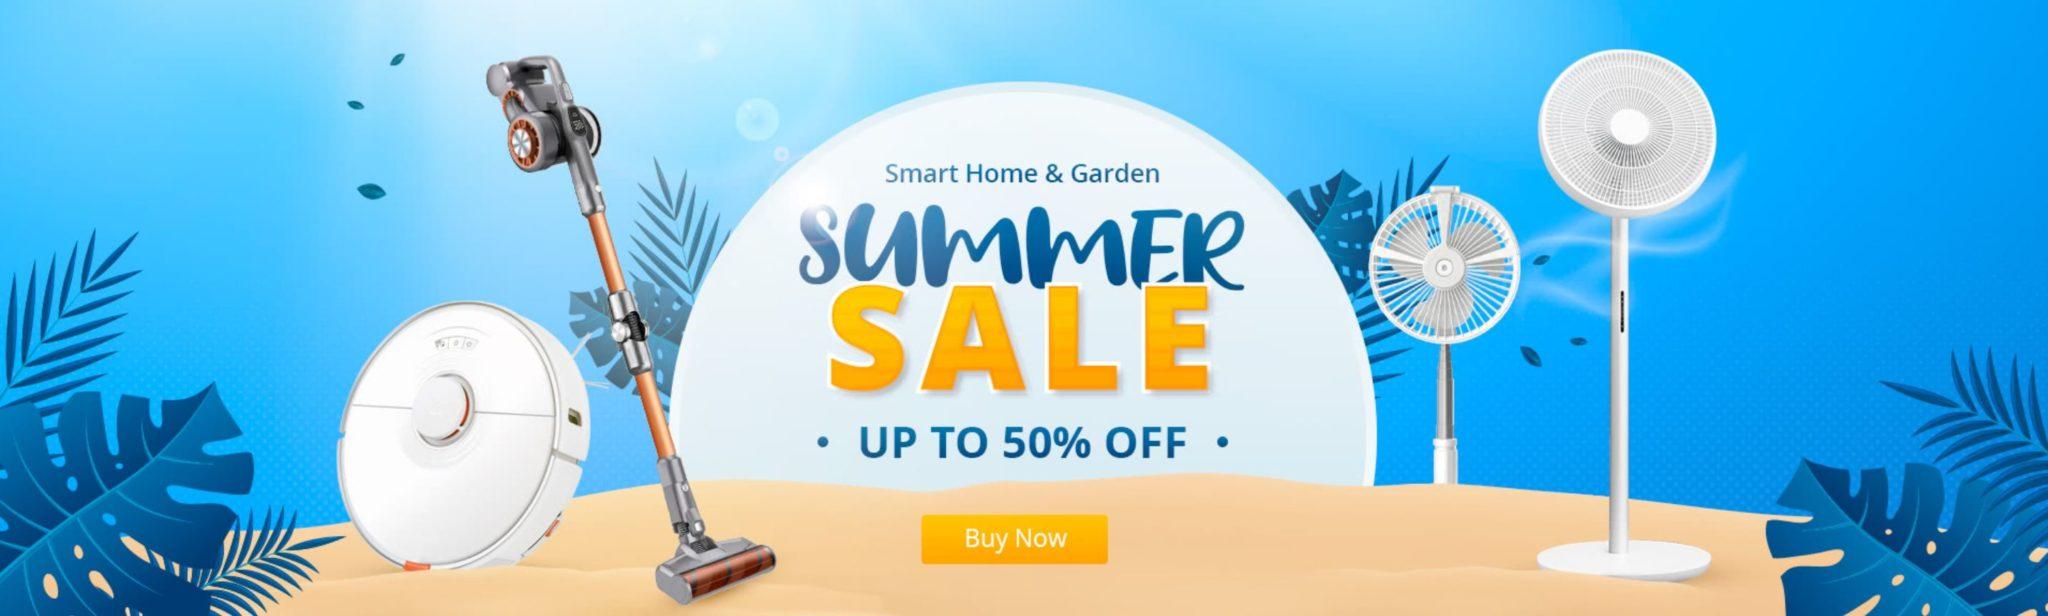 Summer Sale Geekbuying 2021